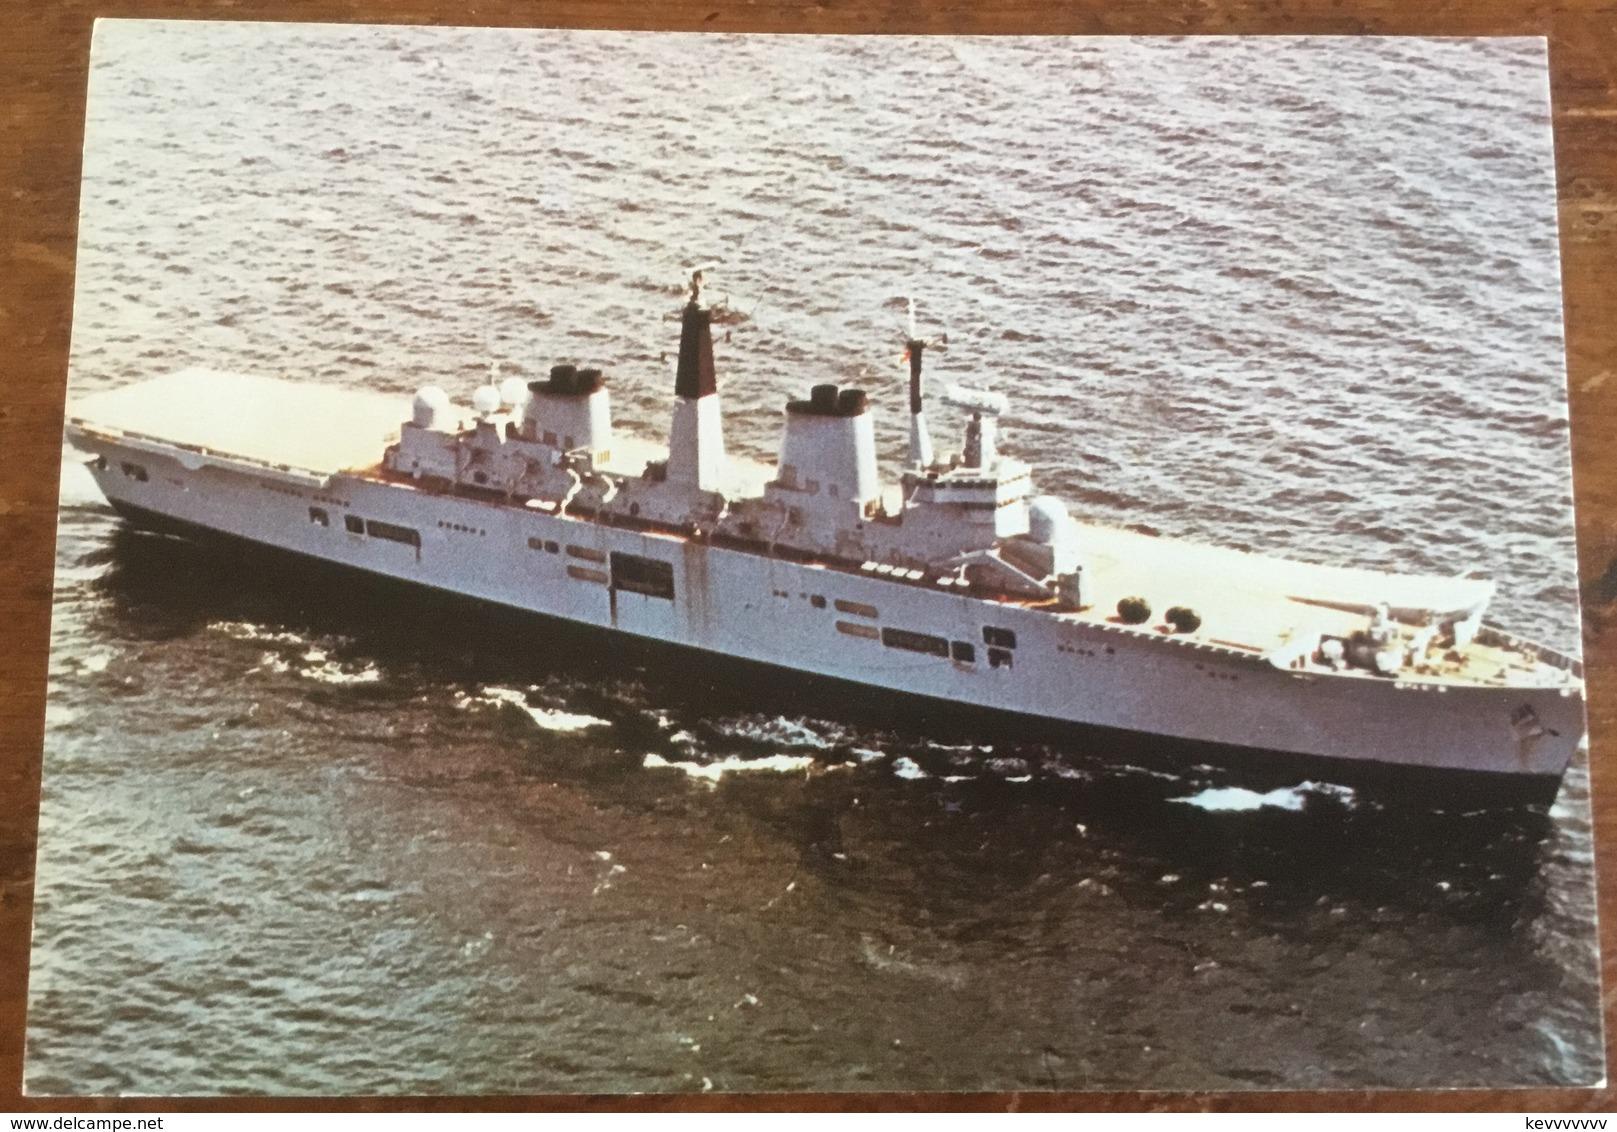 HMS Invincible - Warships